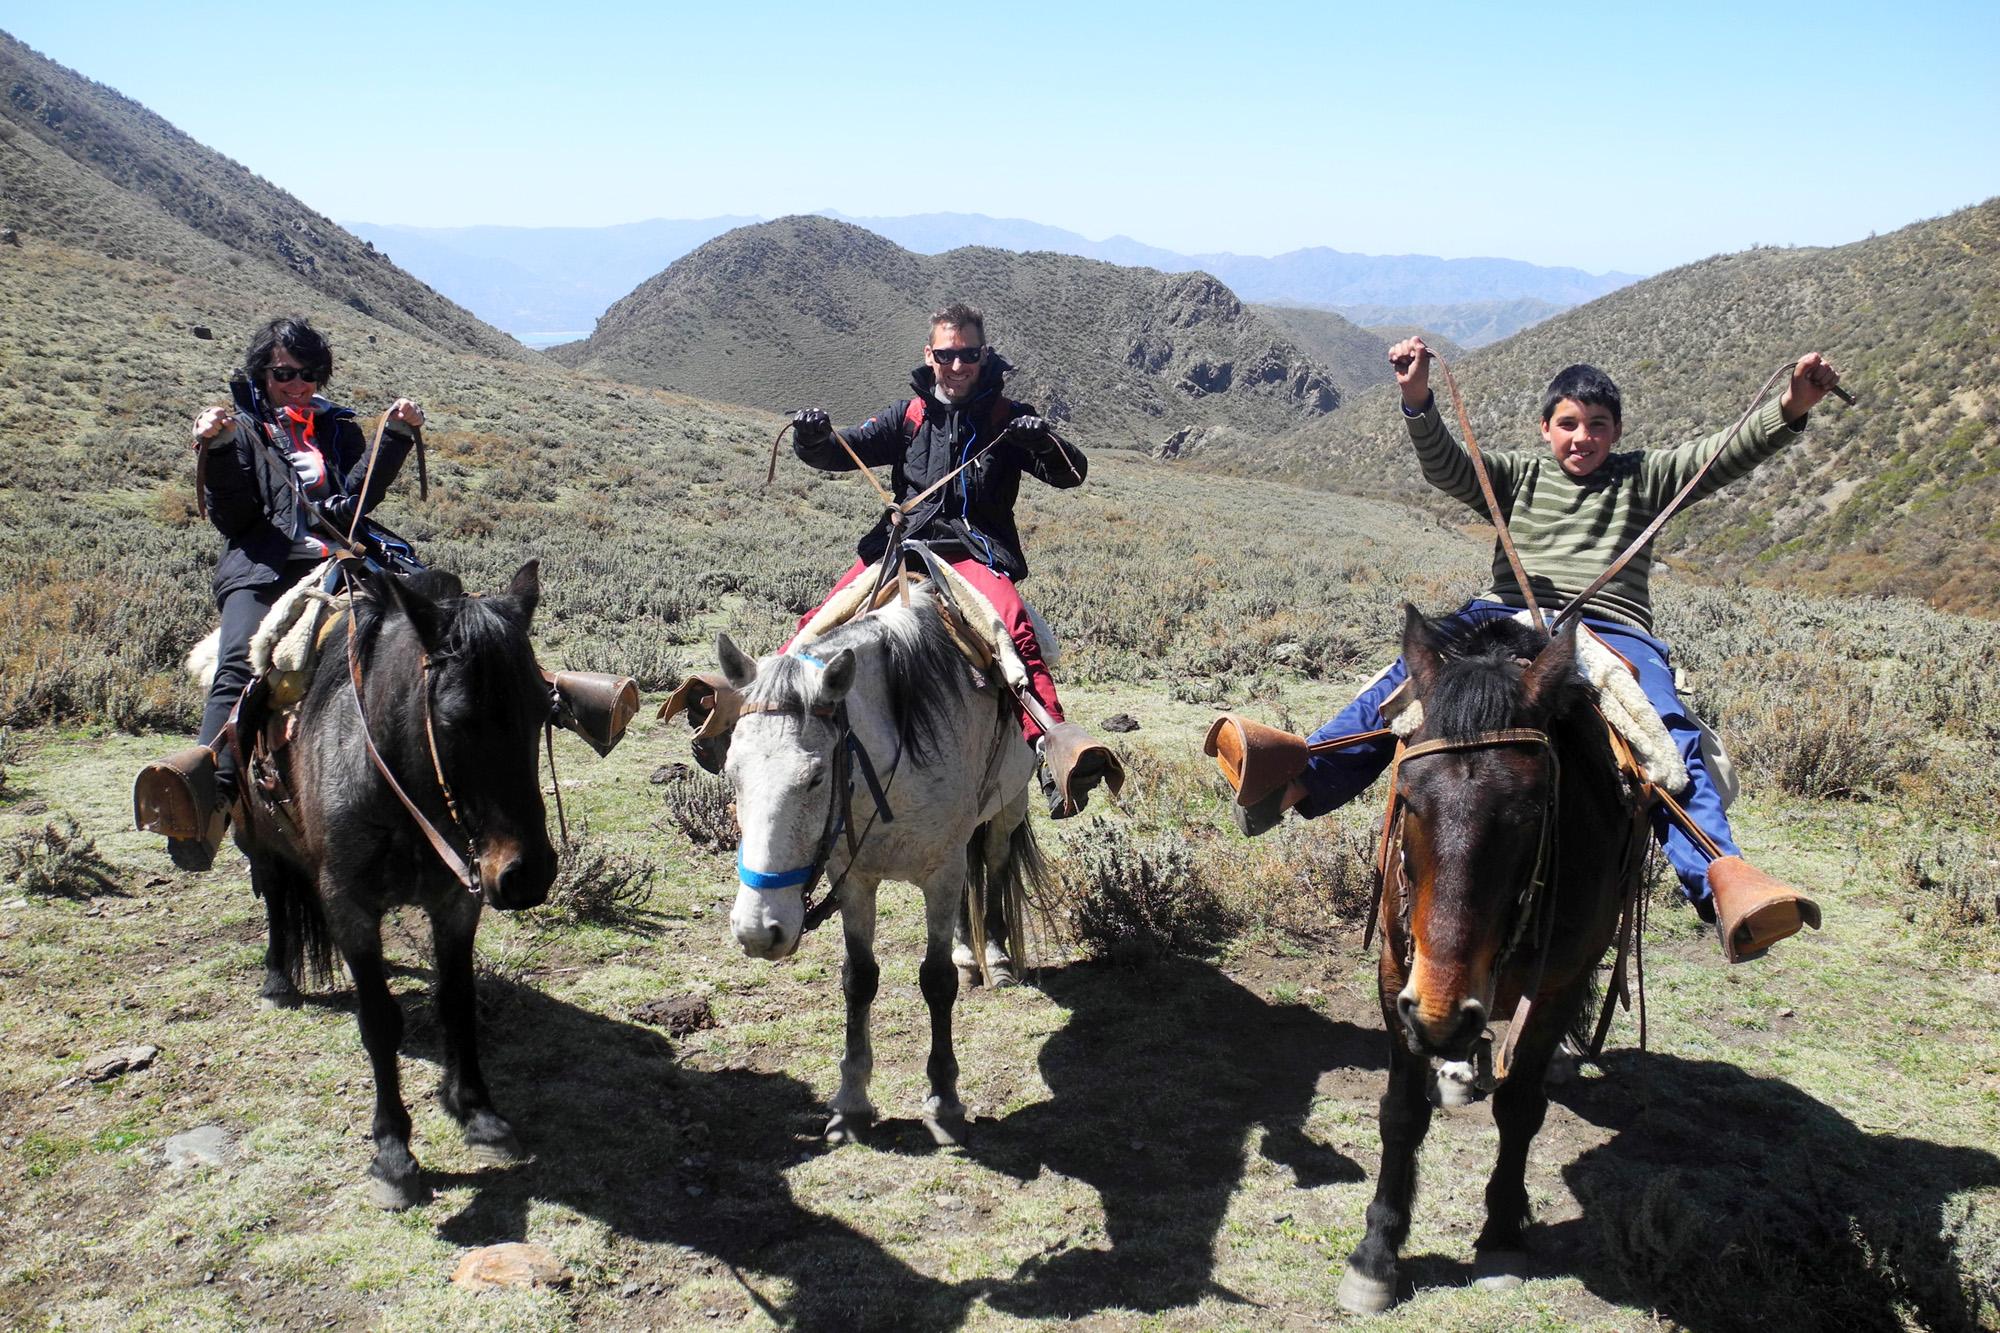 wine-TROTTERS_oenotourisme_wine-tourism-agency_tour_vino_vin_turismo_ARGENTINA_Mendoza_trekking_hiking_horseback-riding_alta-montana_Andes_95_WEB-2000px.jpg